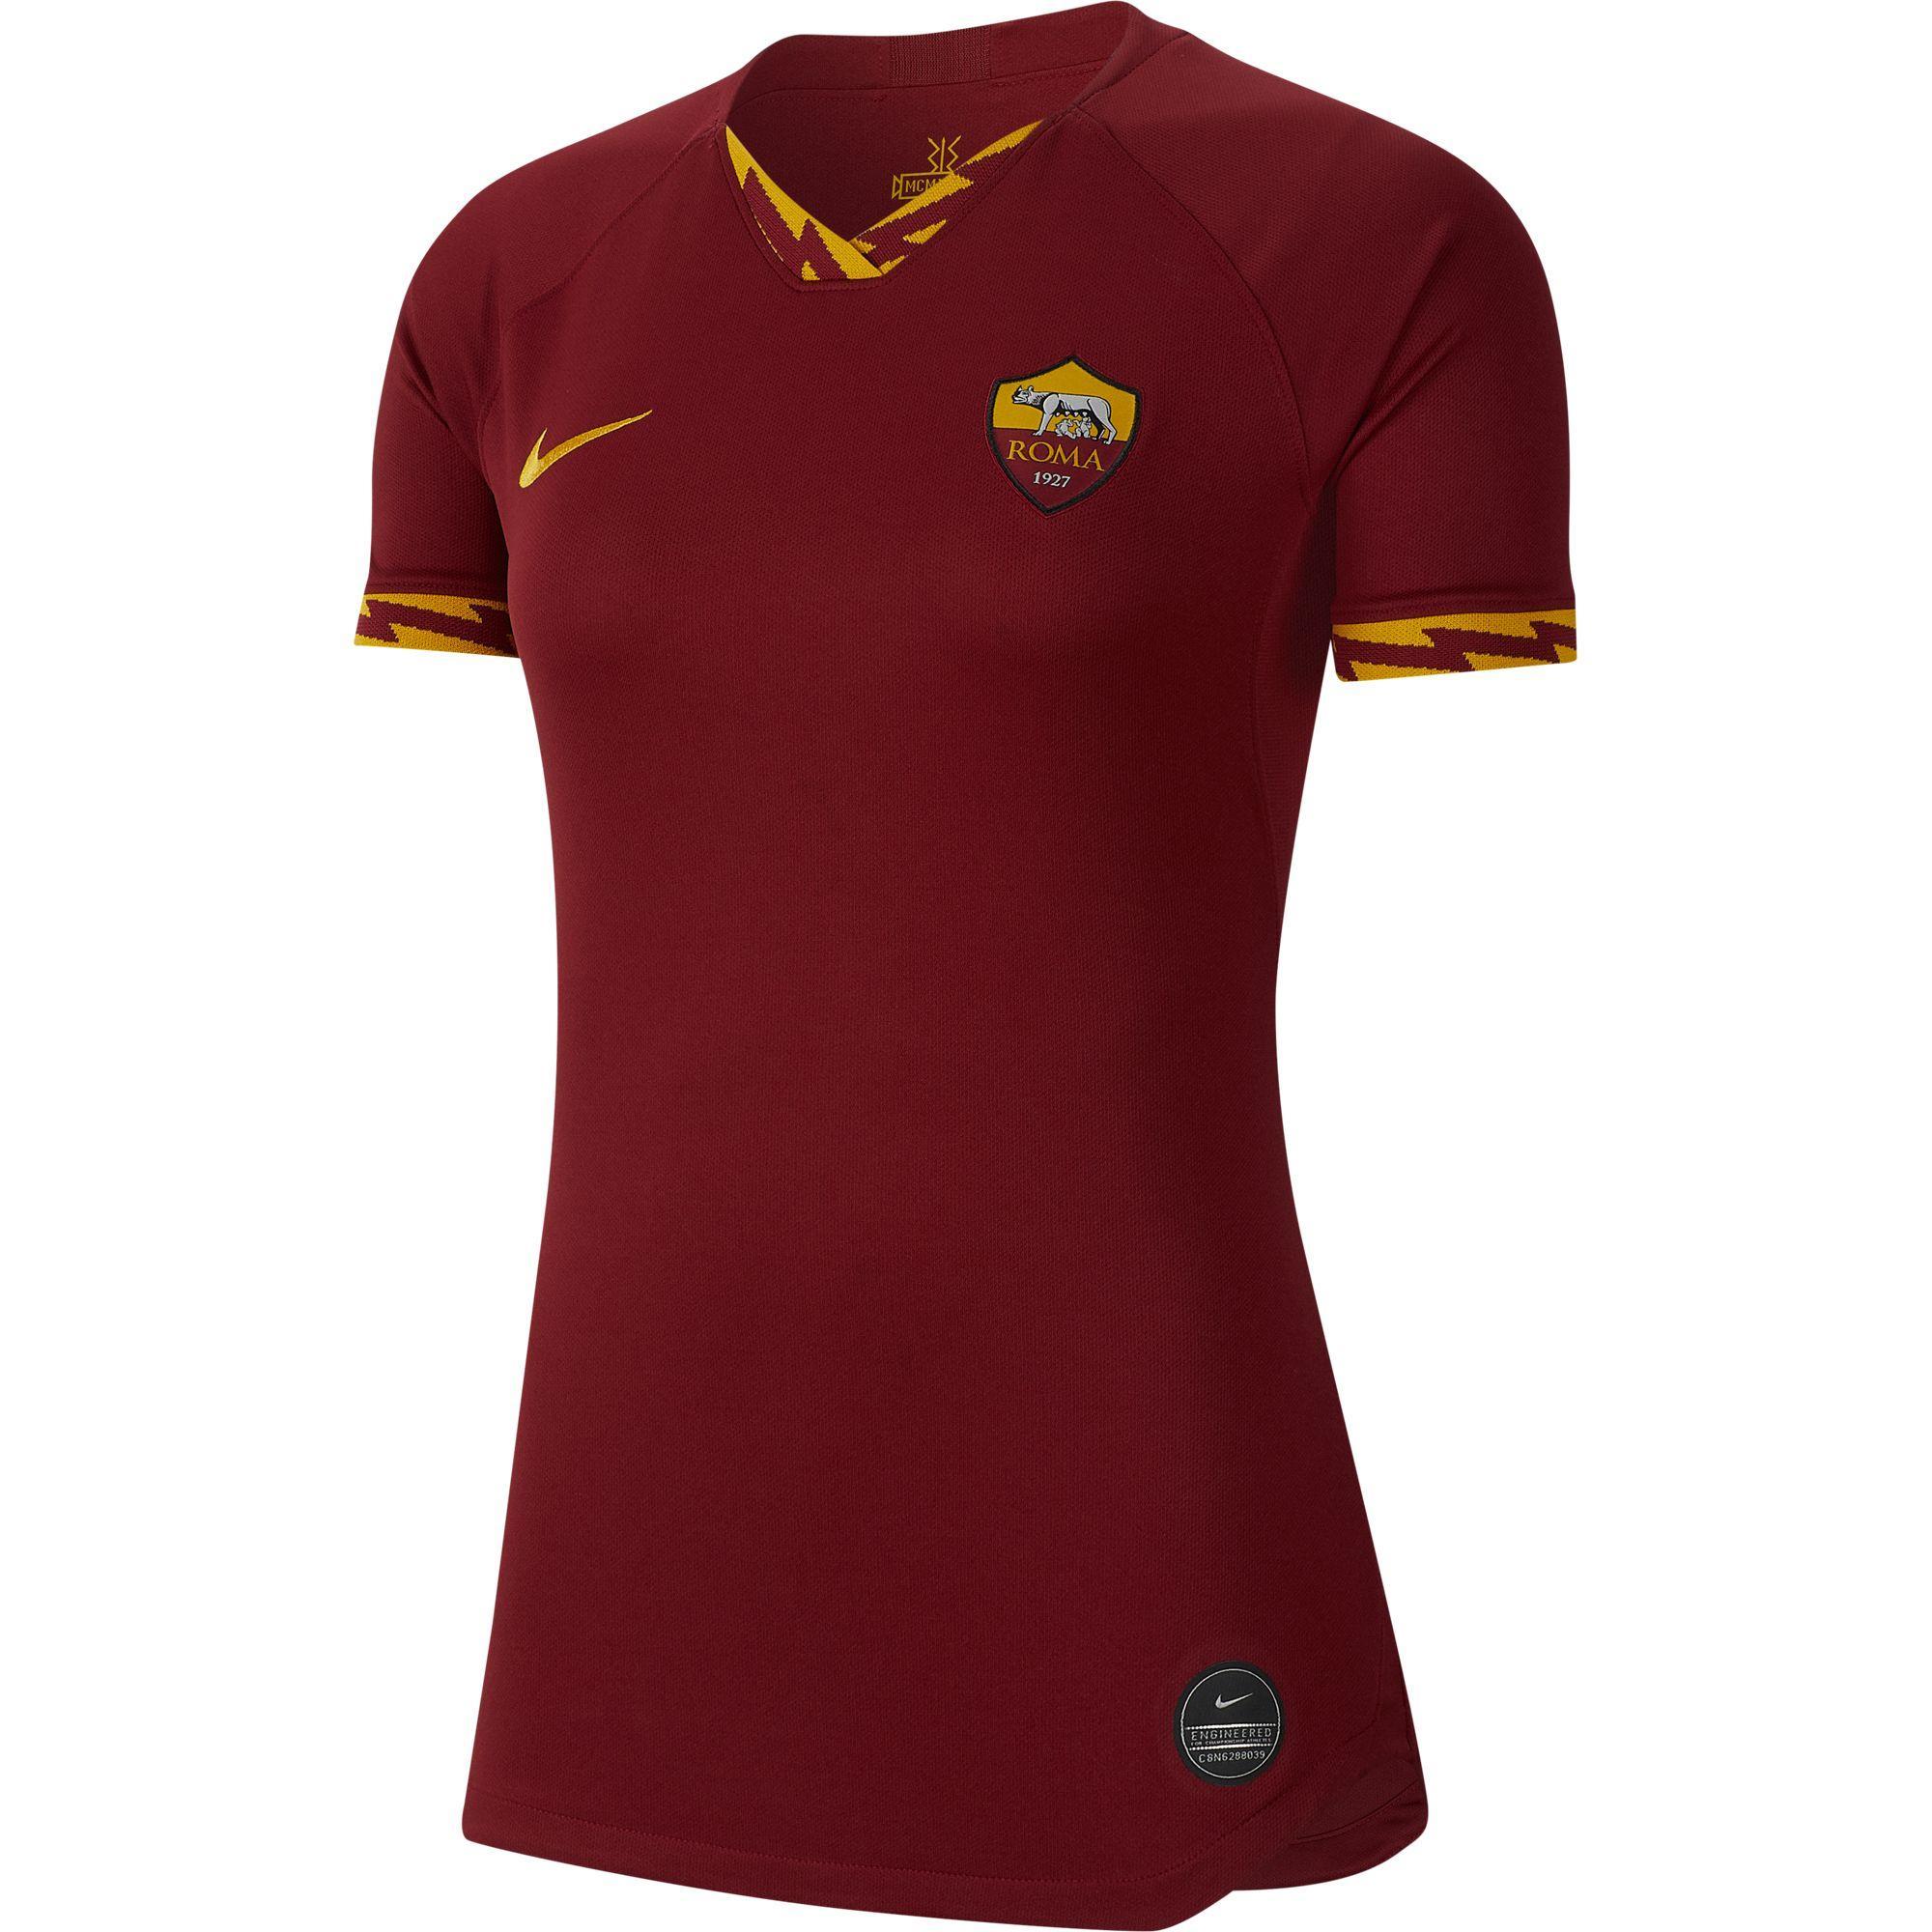 Nike Maglia Gara Home Roma Donna  19/20